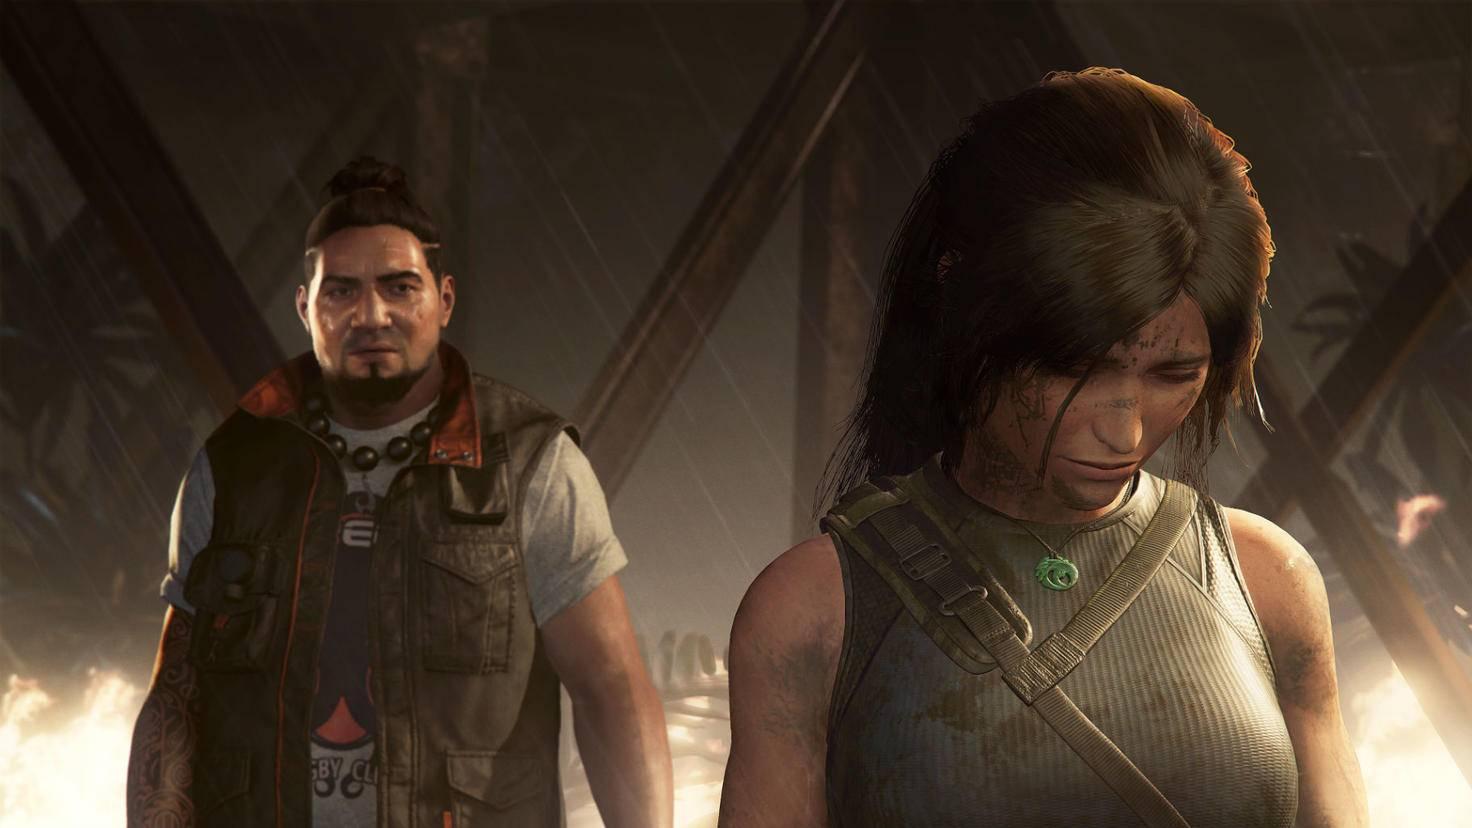 shadow-of-the-tomb-raider-screenshot-02